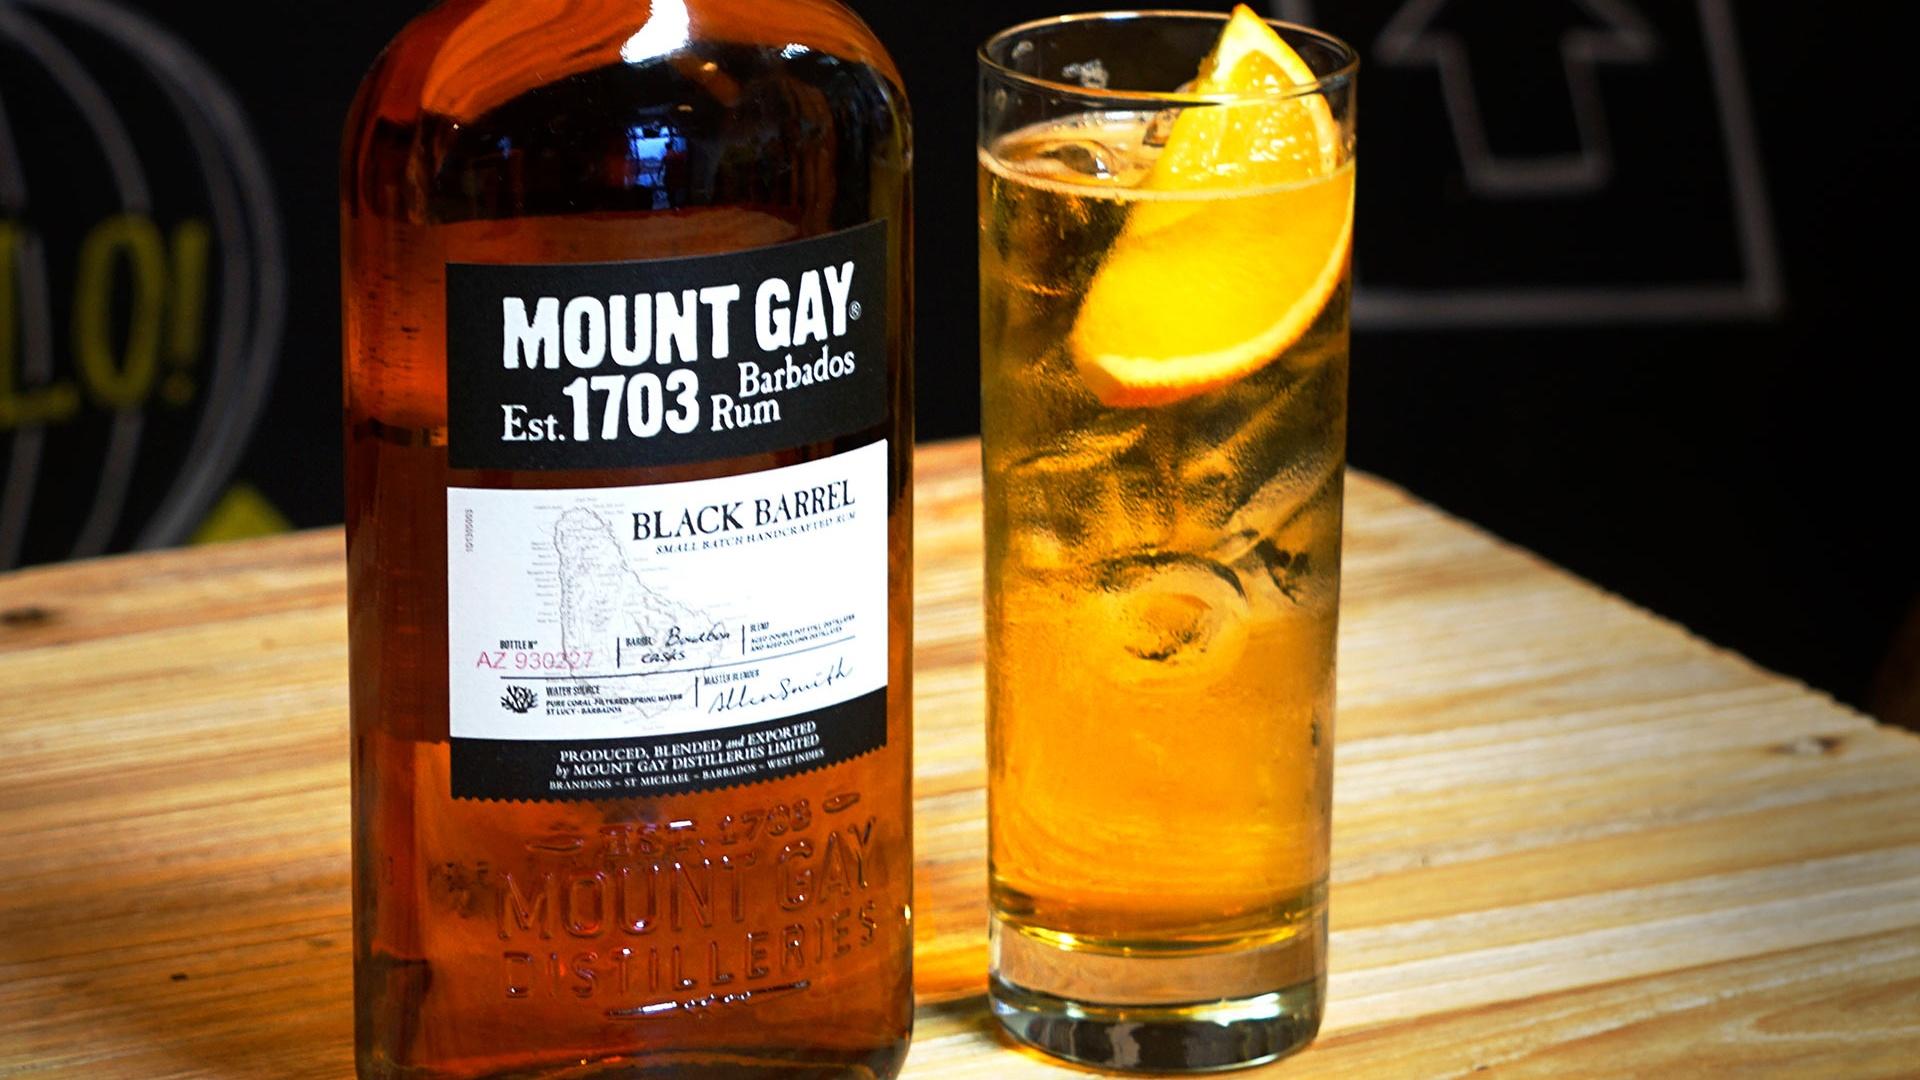 Mount Gay Black Barrell